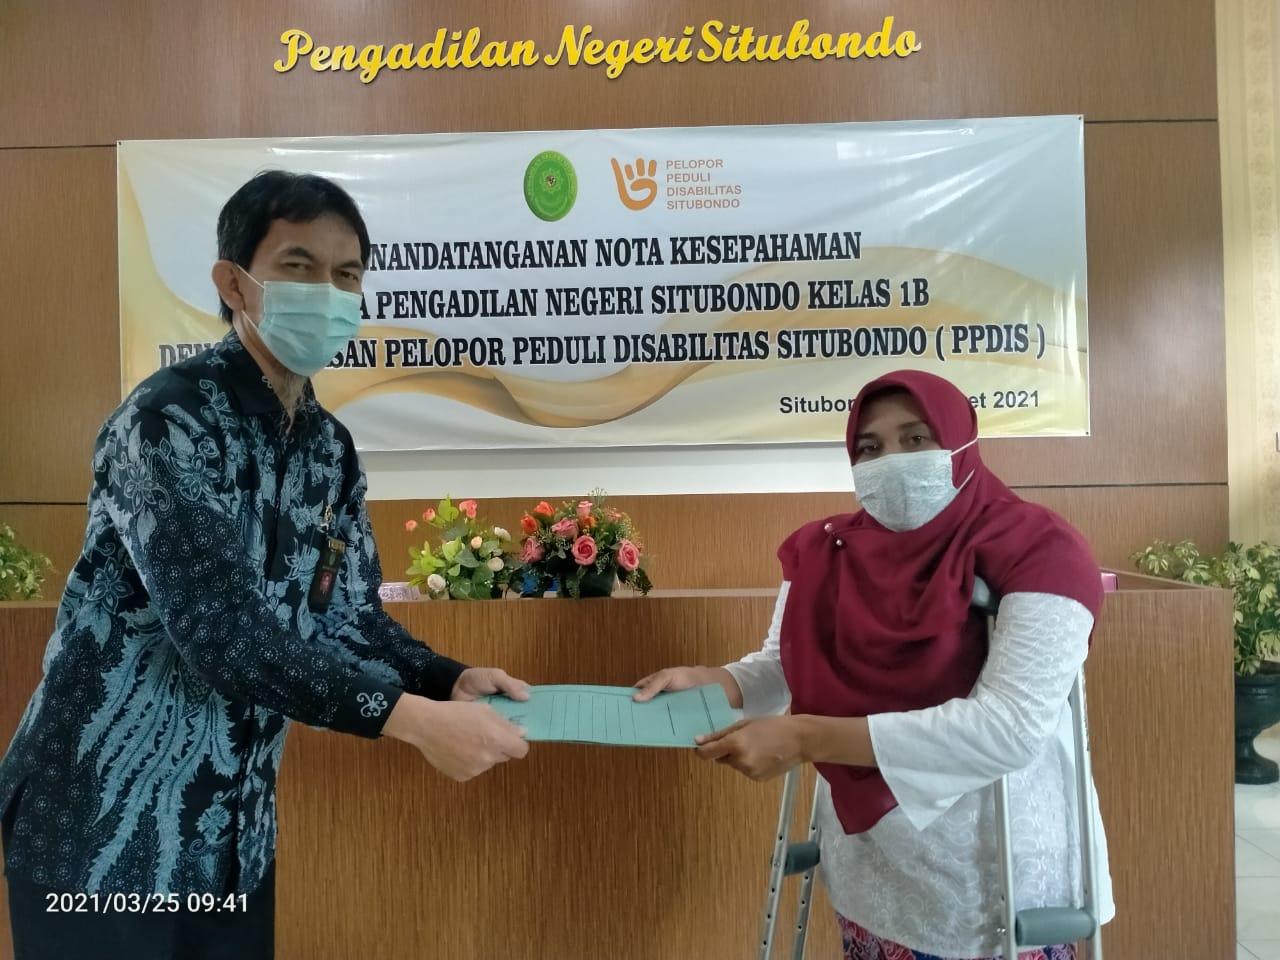 Penandatanganan Nota Kesepahaman Antara Pengadilan Negeri Situbondo Kelas 1 B dan Yayasan Pelopor Peduli Disabilitas Situbondo ( PPIDS )